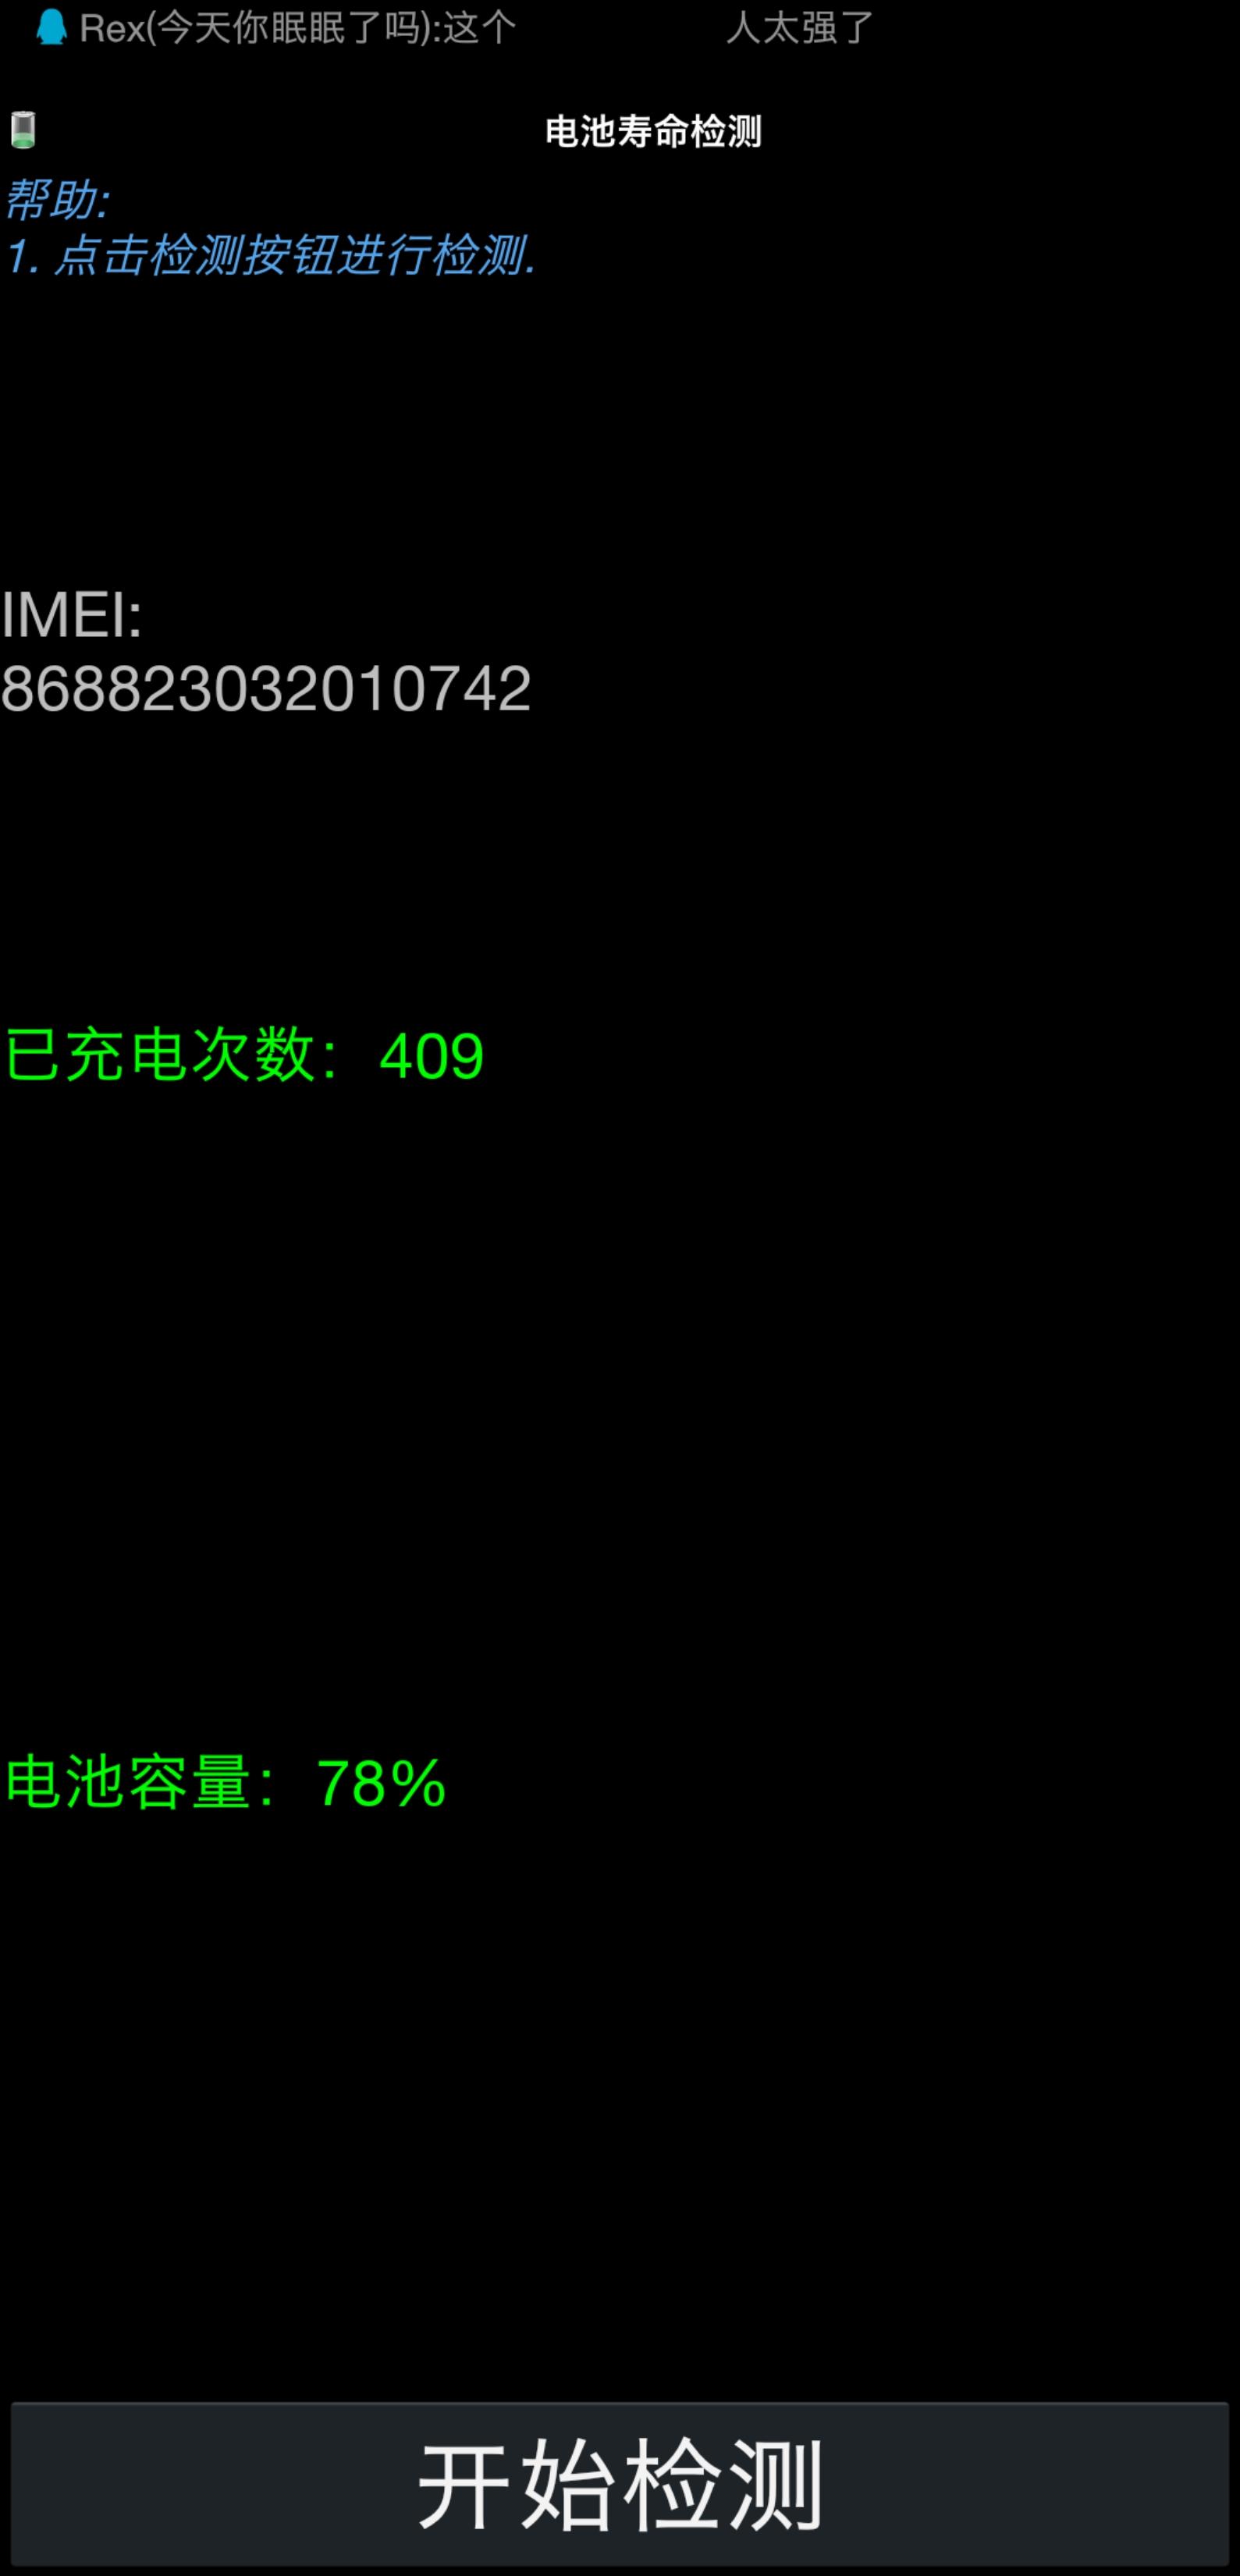 Screenshot_2019-08-18-00-24-19-023_??????.png